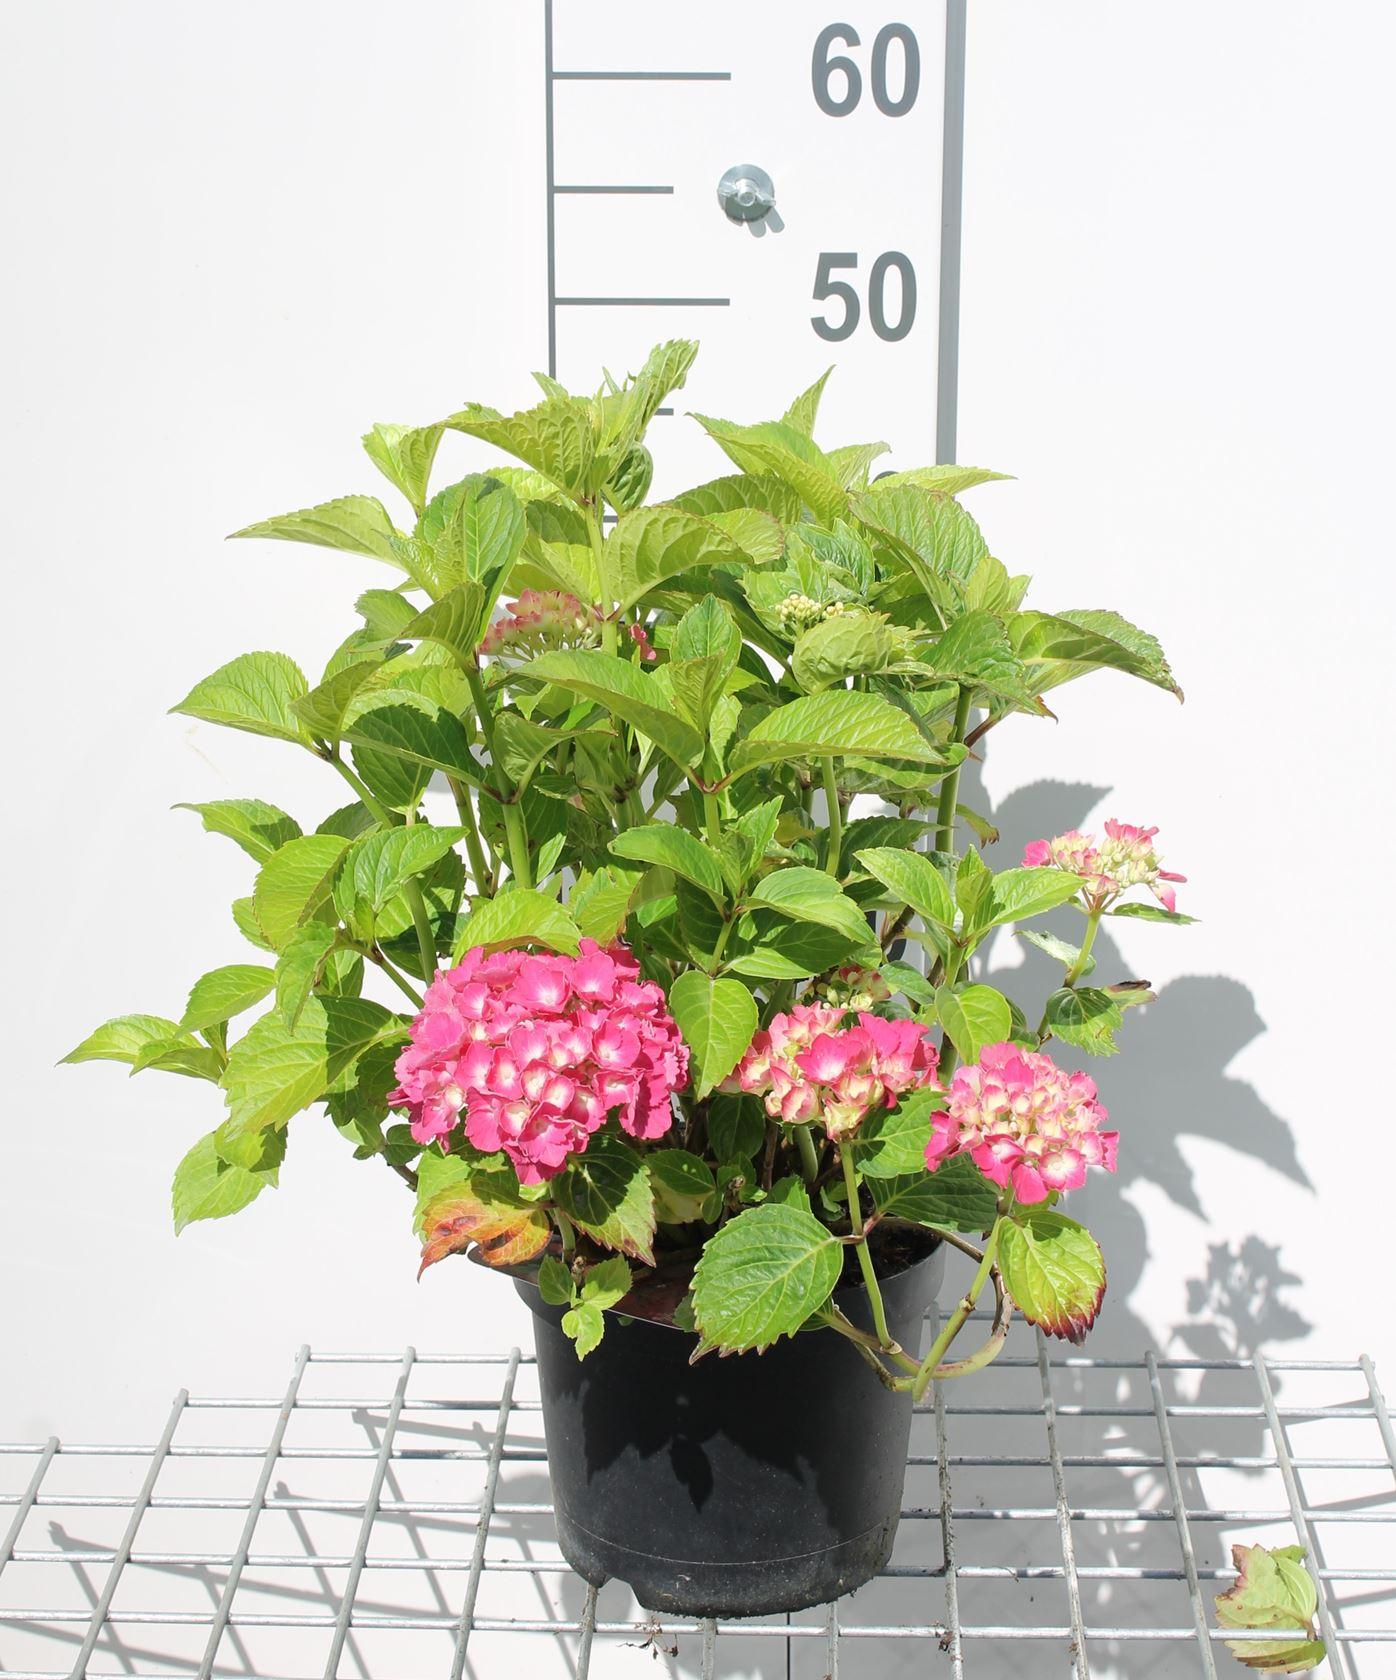 Hydrangea macr. rood/rouge 25-30 cm CO